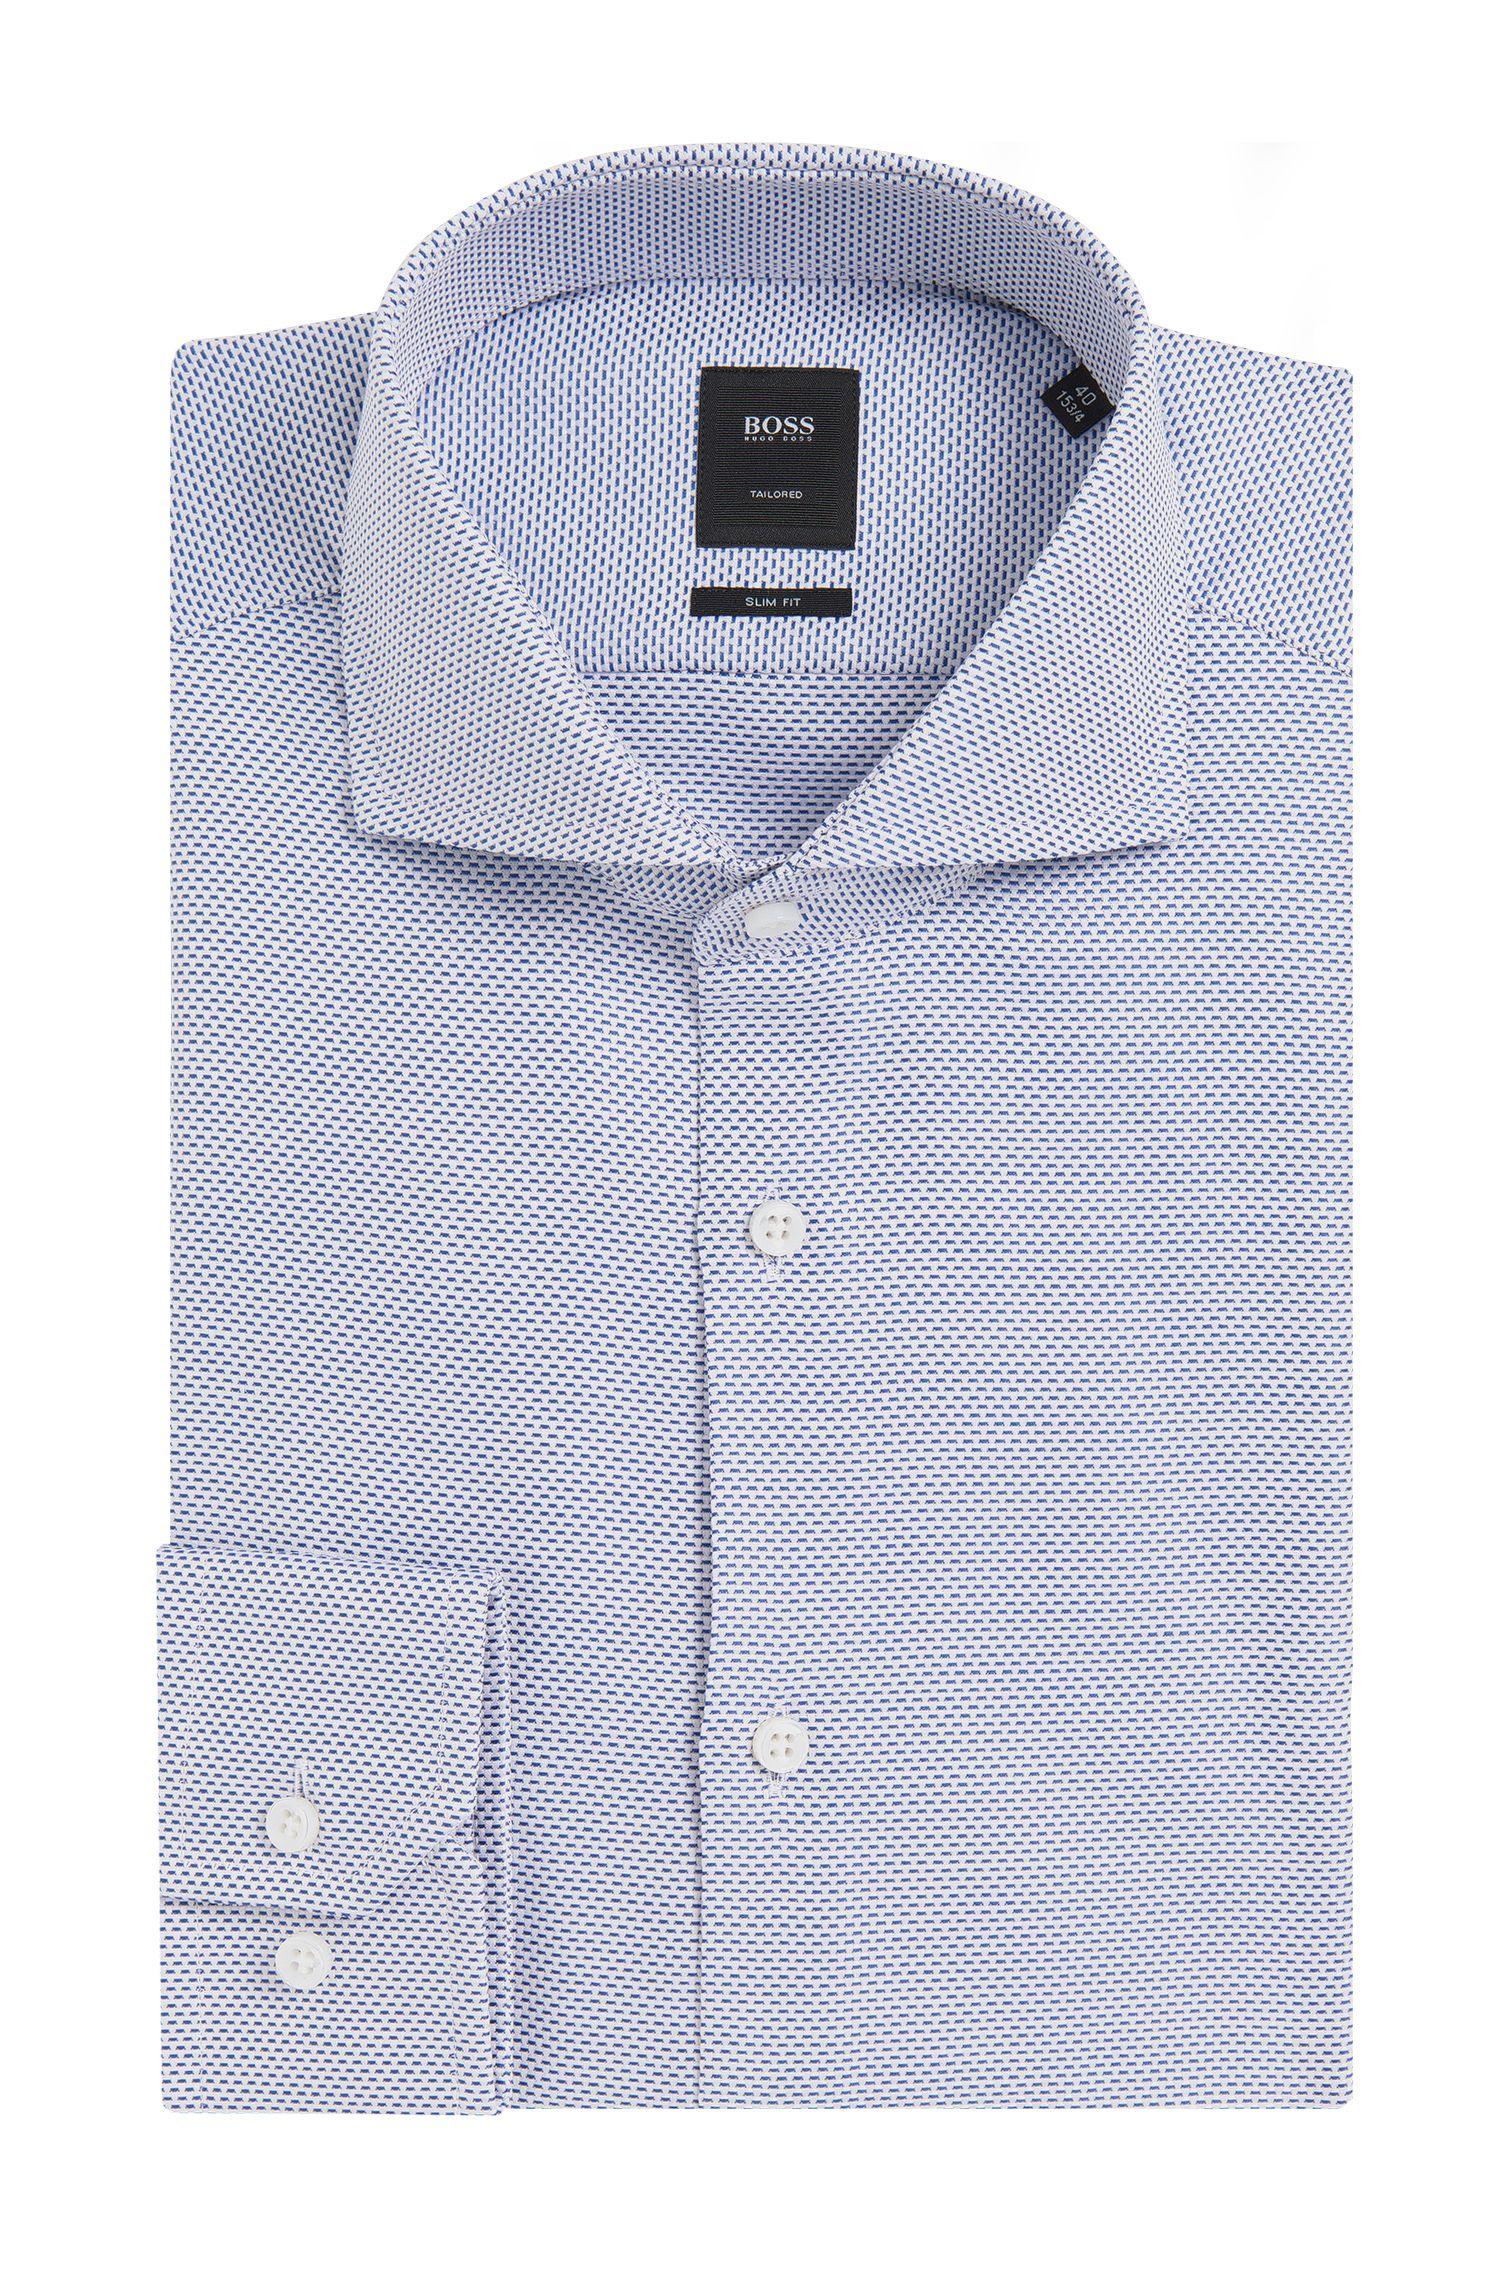 Gemustertes Slim-Fit Tailored Hemd aus Baumwolle: 'T-Christo'